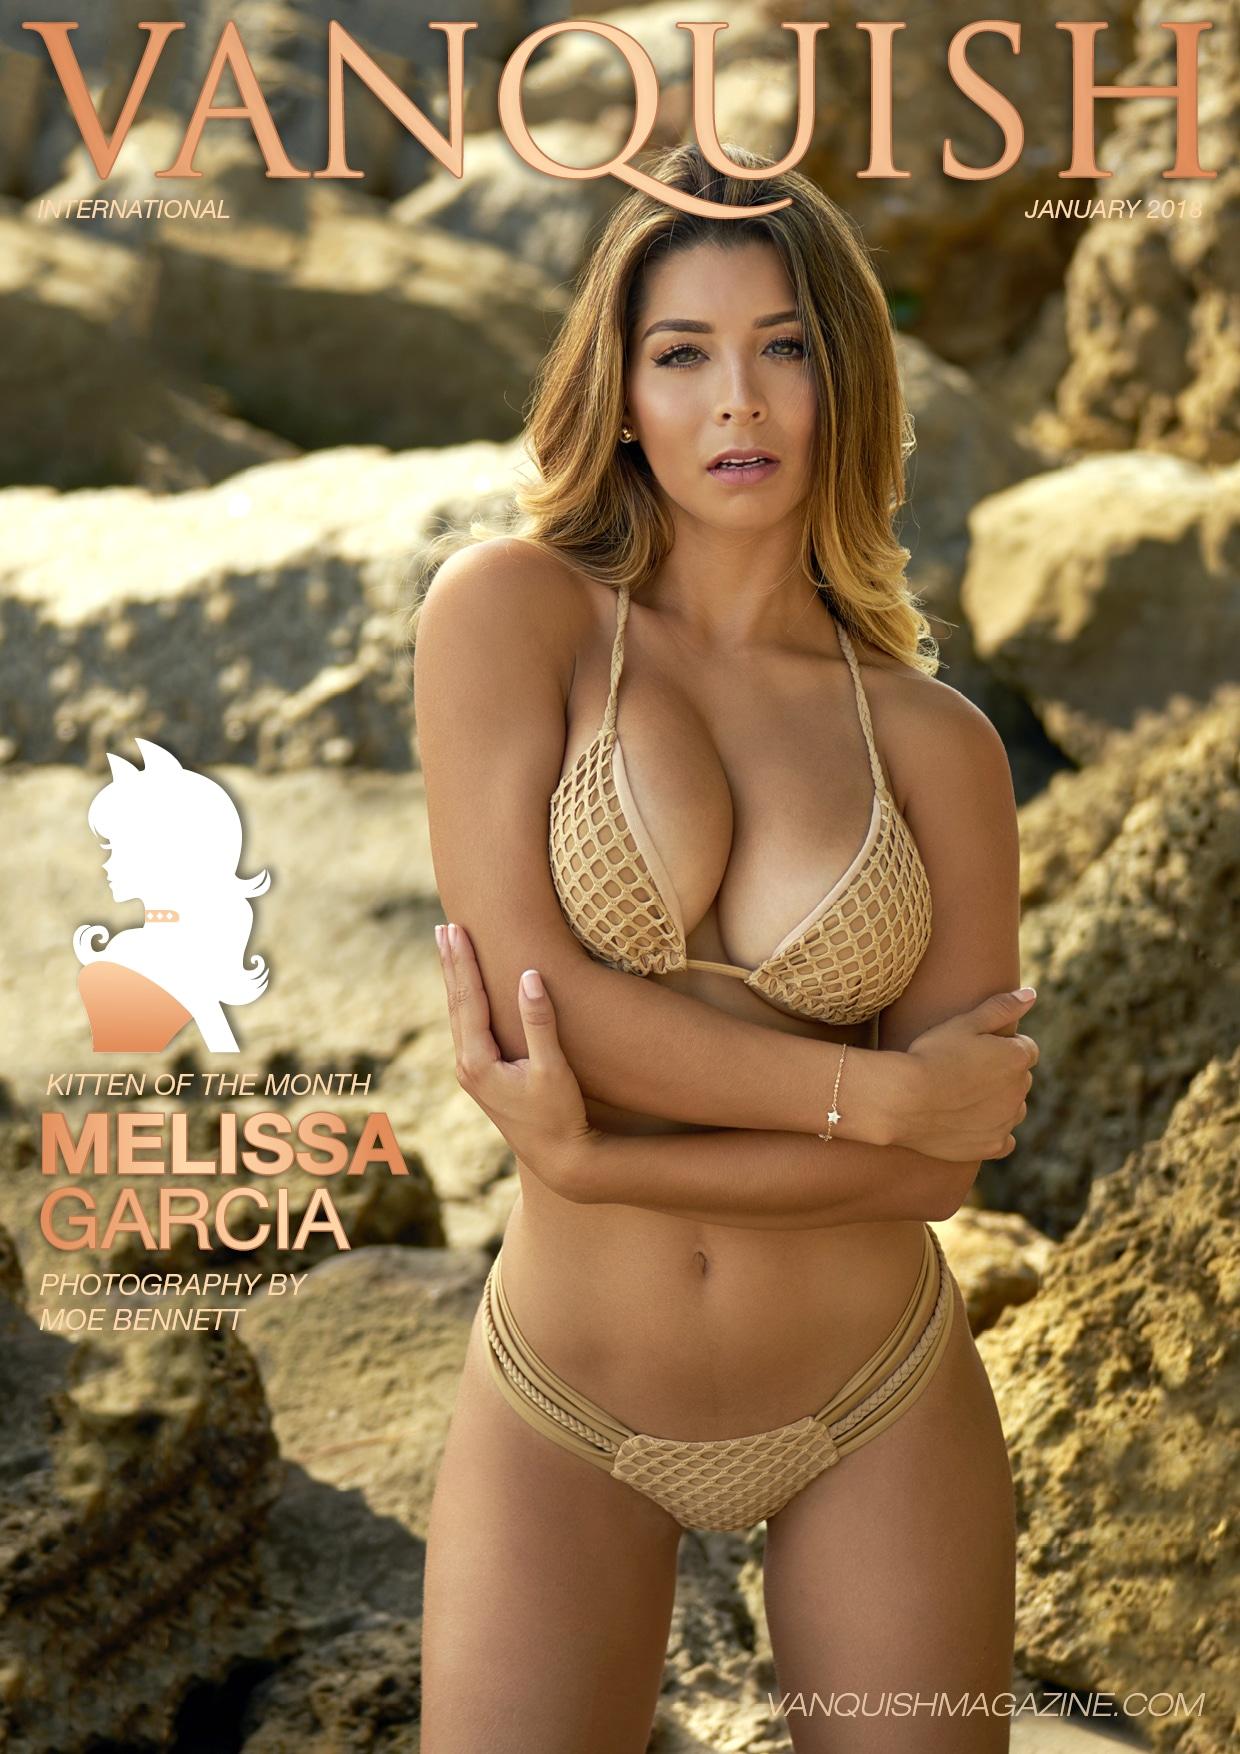 Vanquish Magazine - January 2018 - Melissa Garcia 1